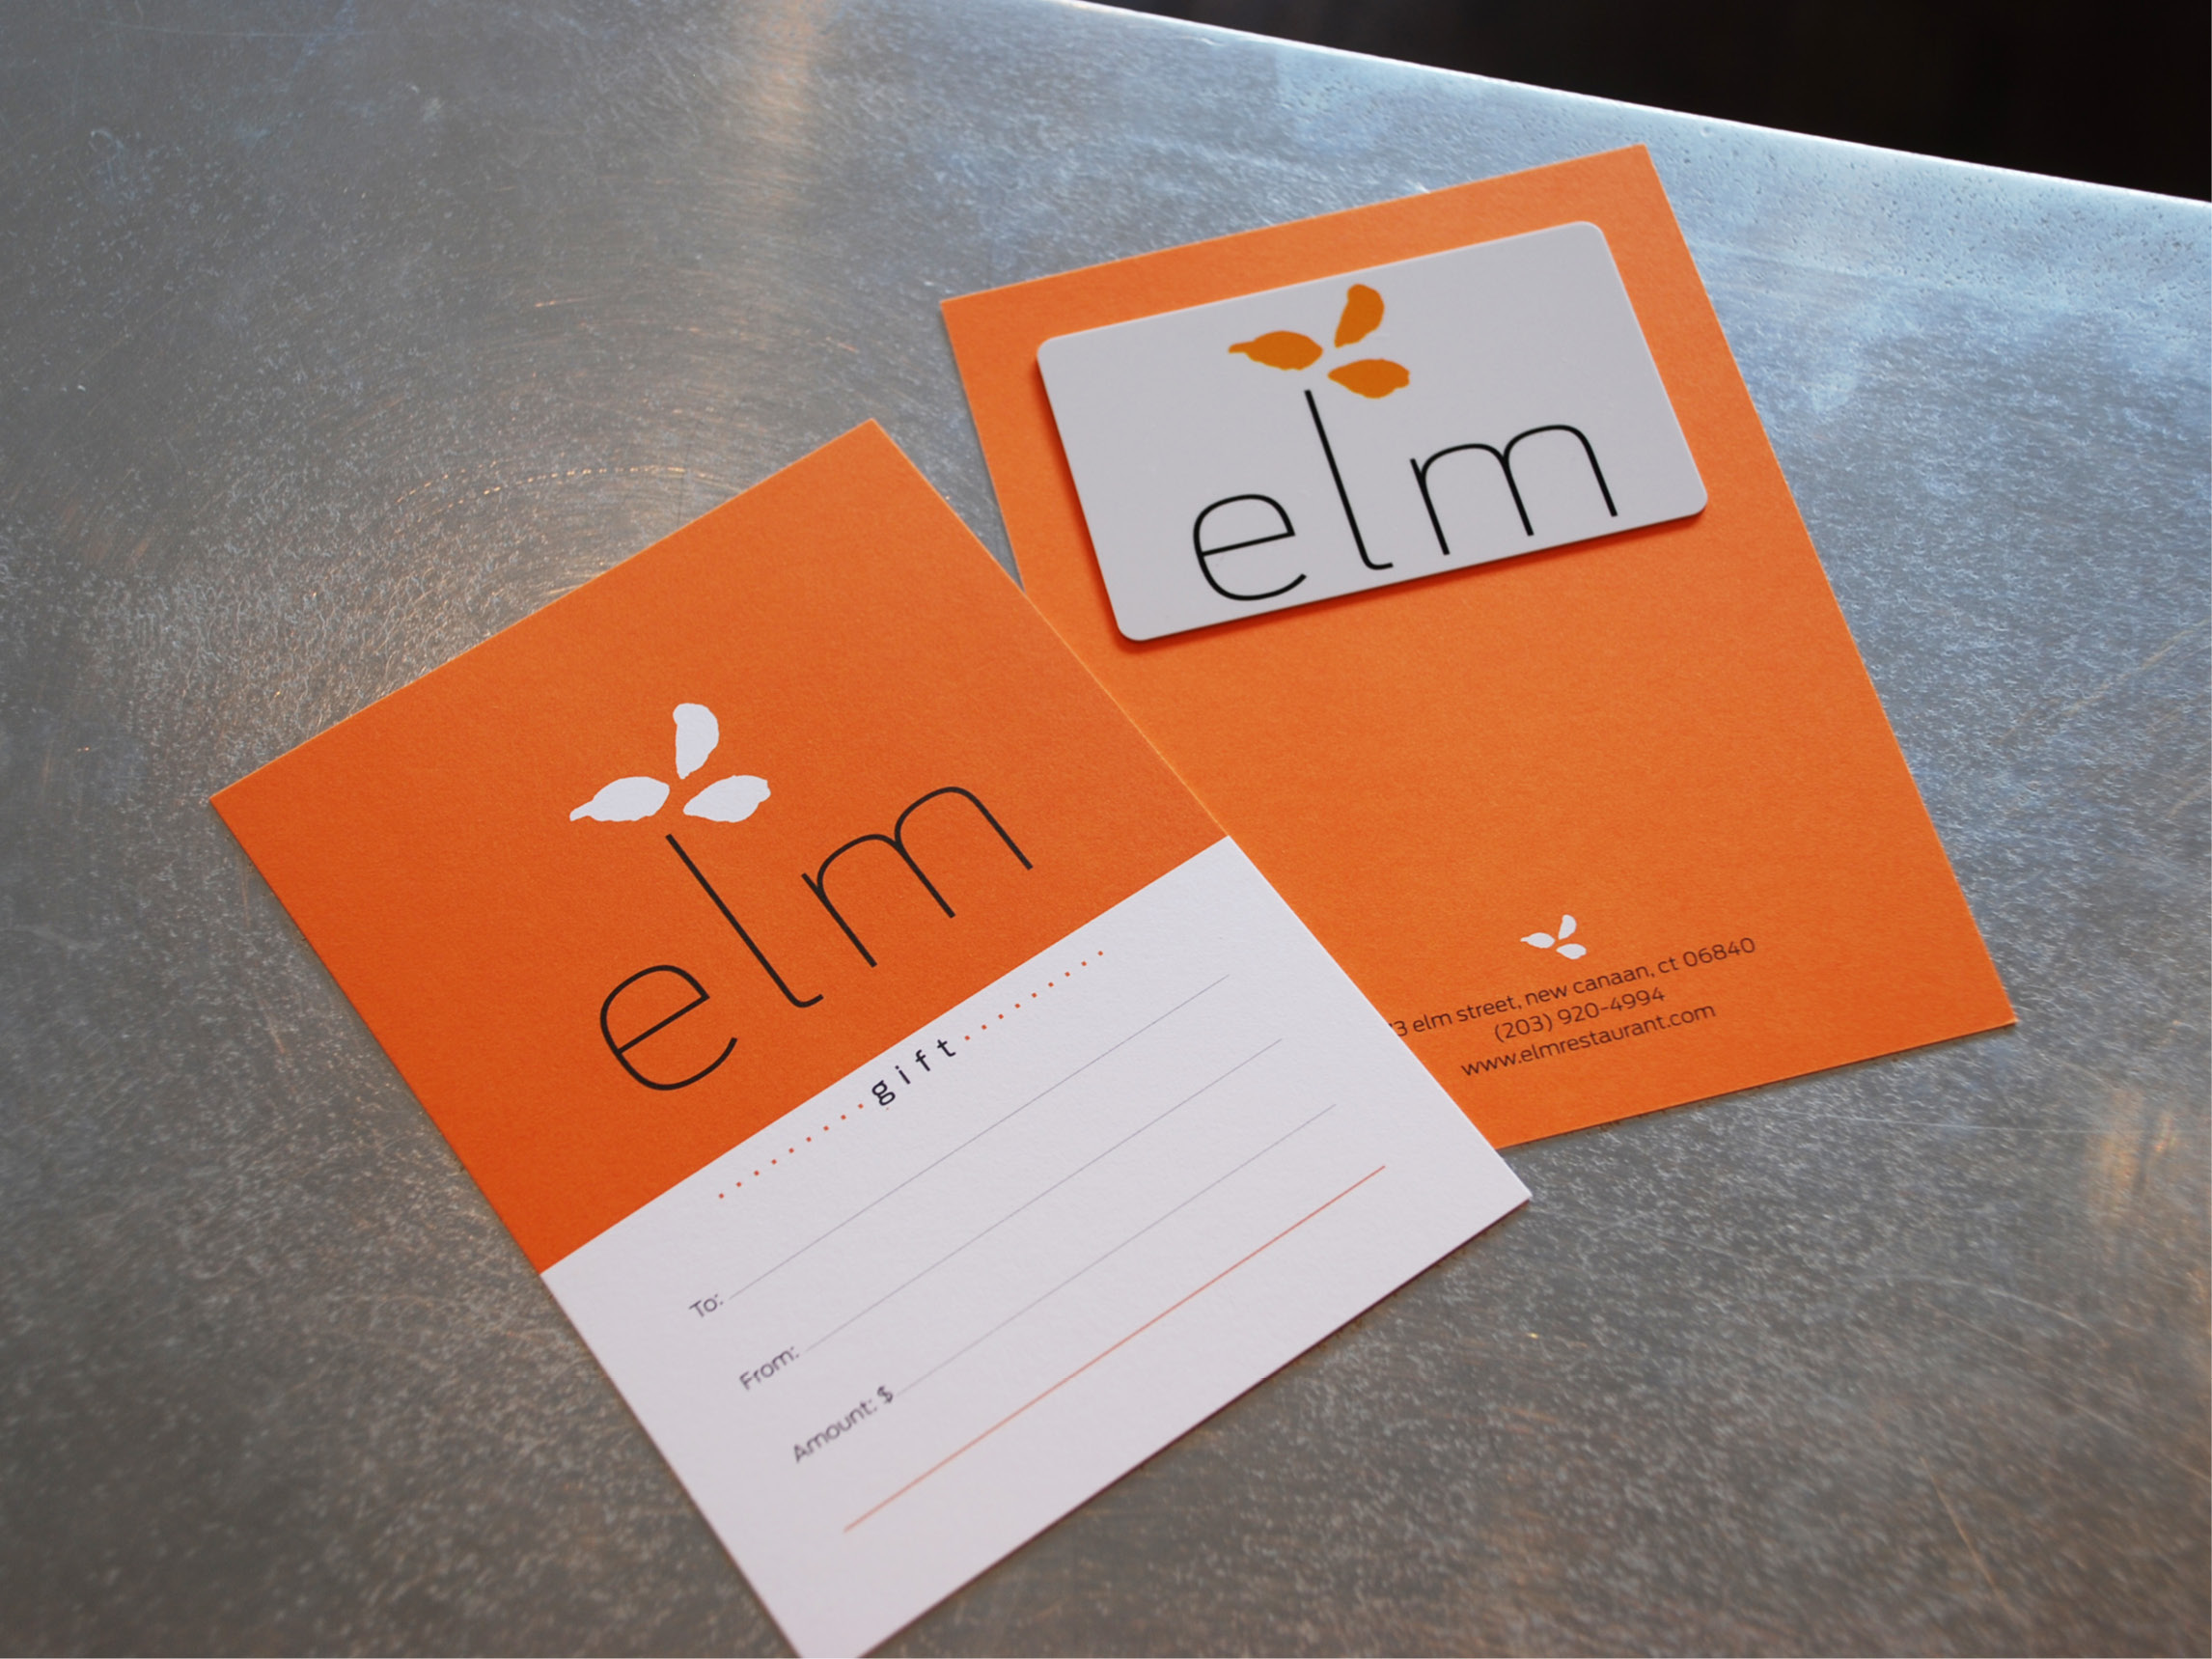 DMD_Gift Card_elm 01_150.jpg